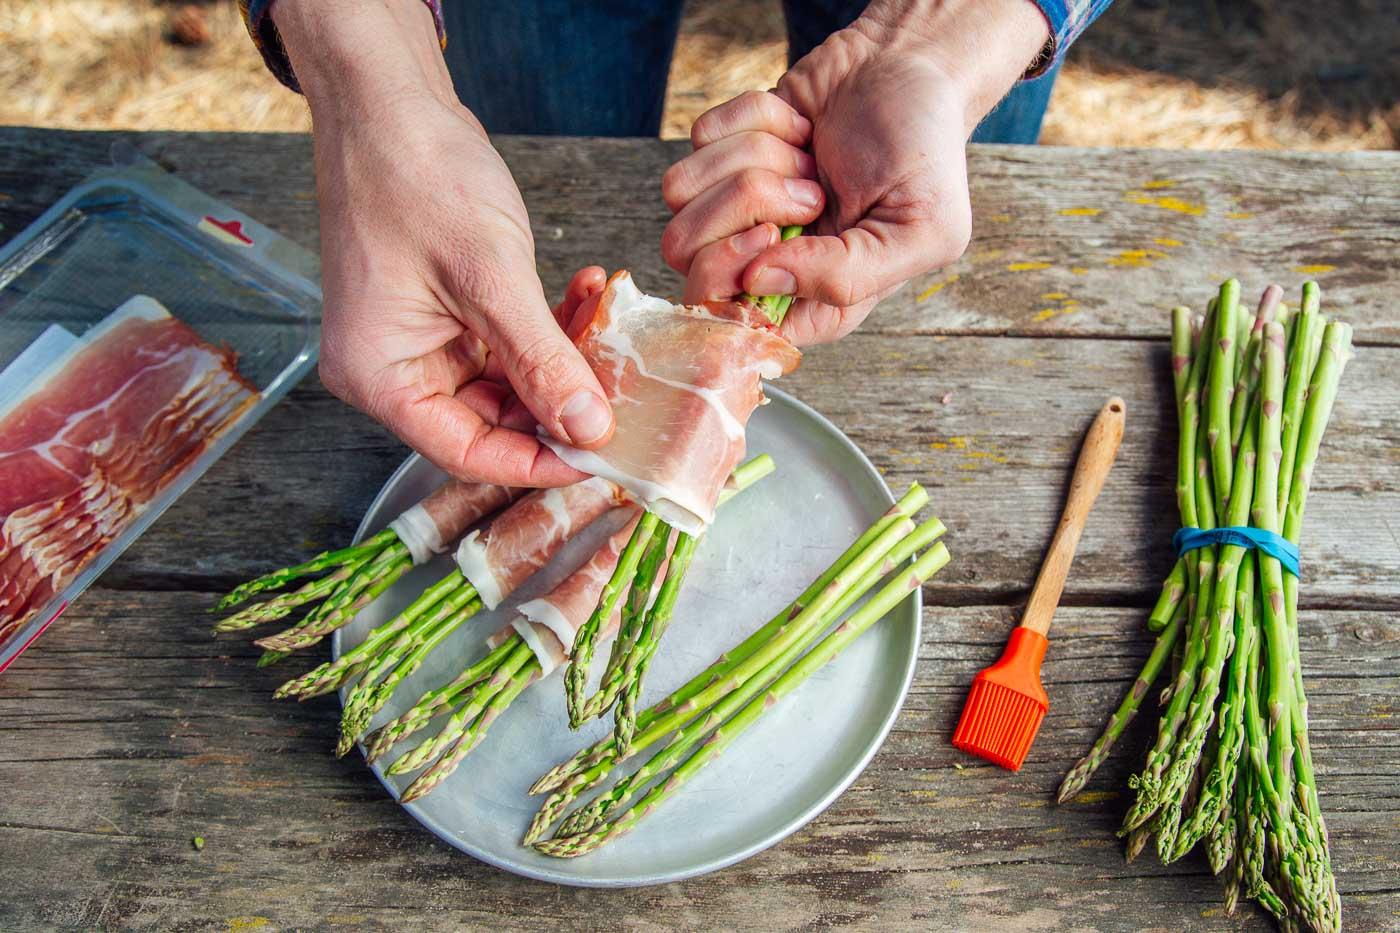 Michael wrapping prosciutto around asparagus stalks